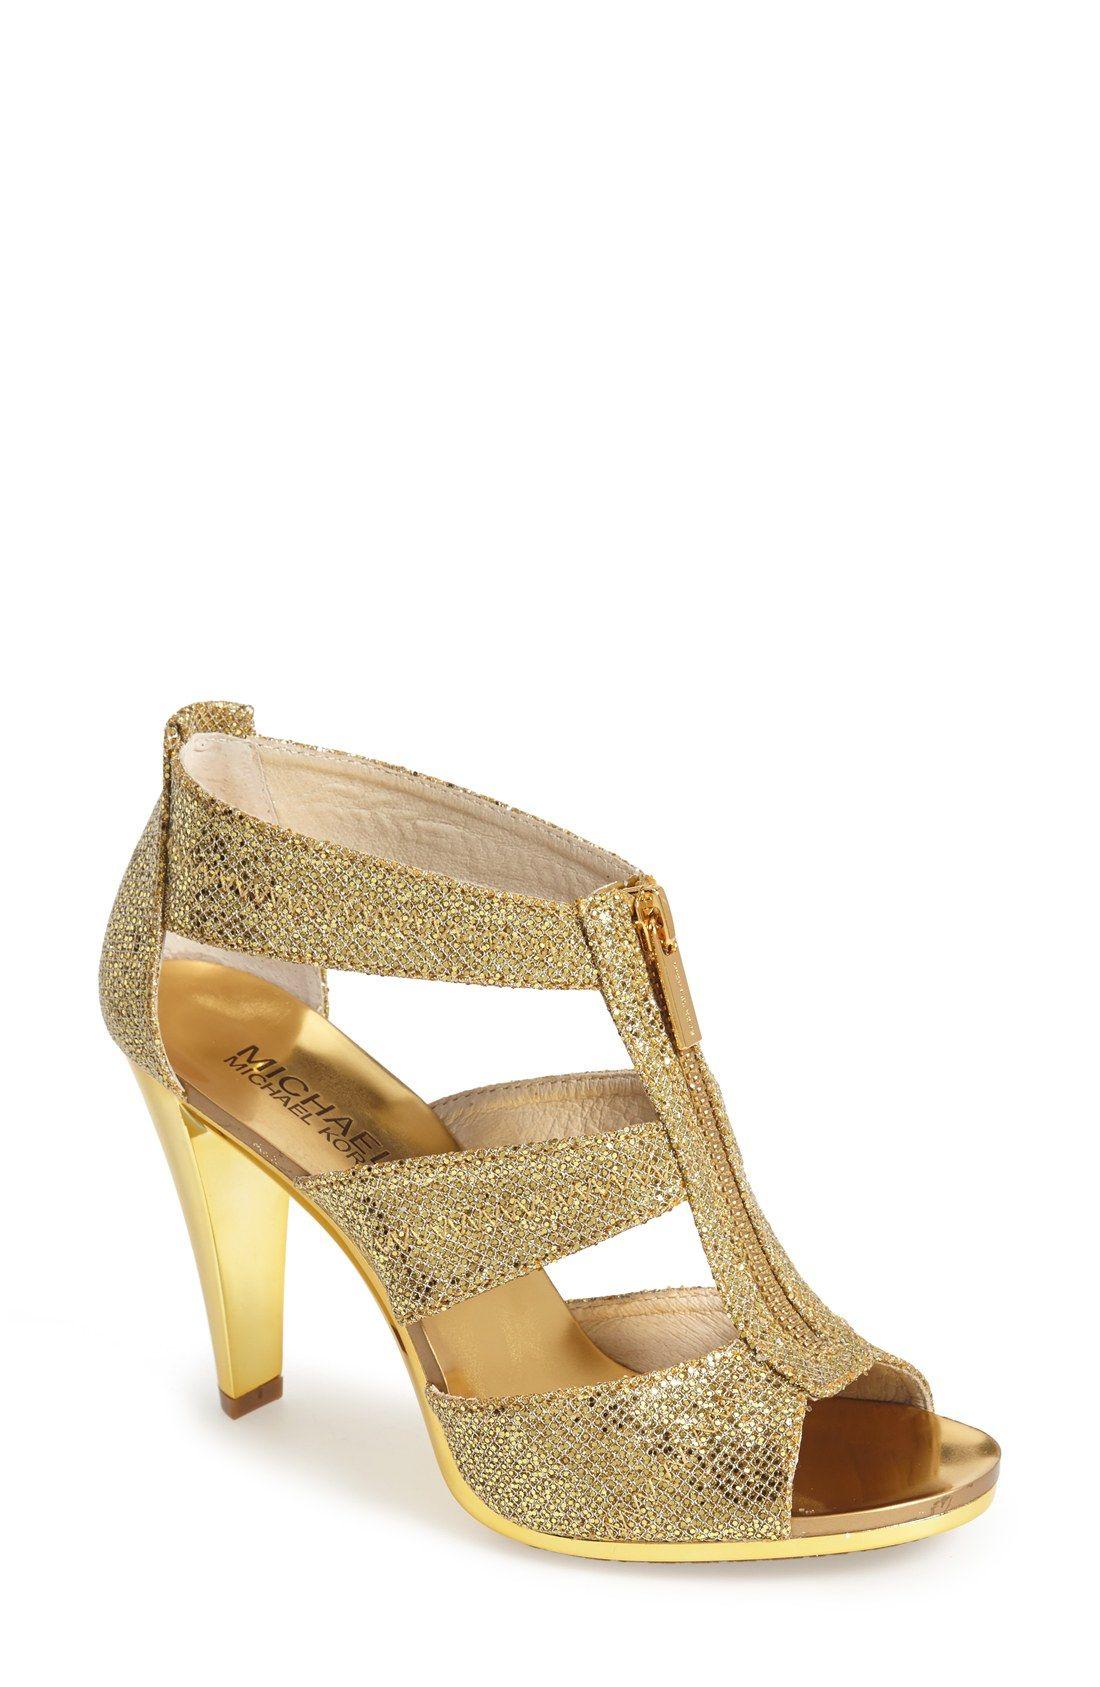 Berkley' T-Strap Sandal | Michael kors sandals, Michael kors and ...